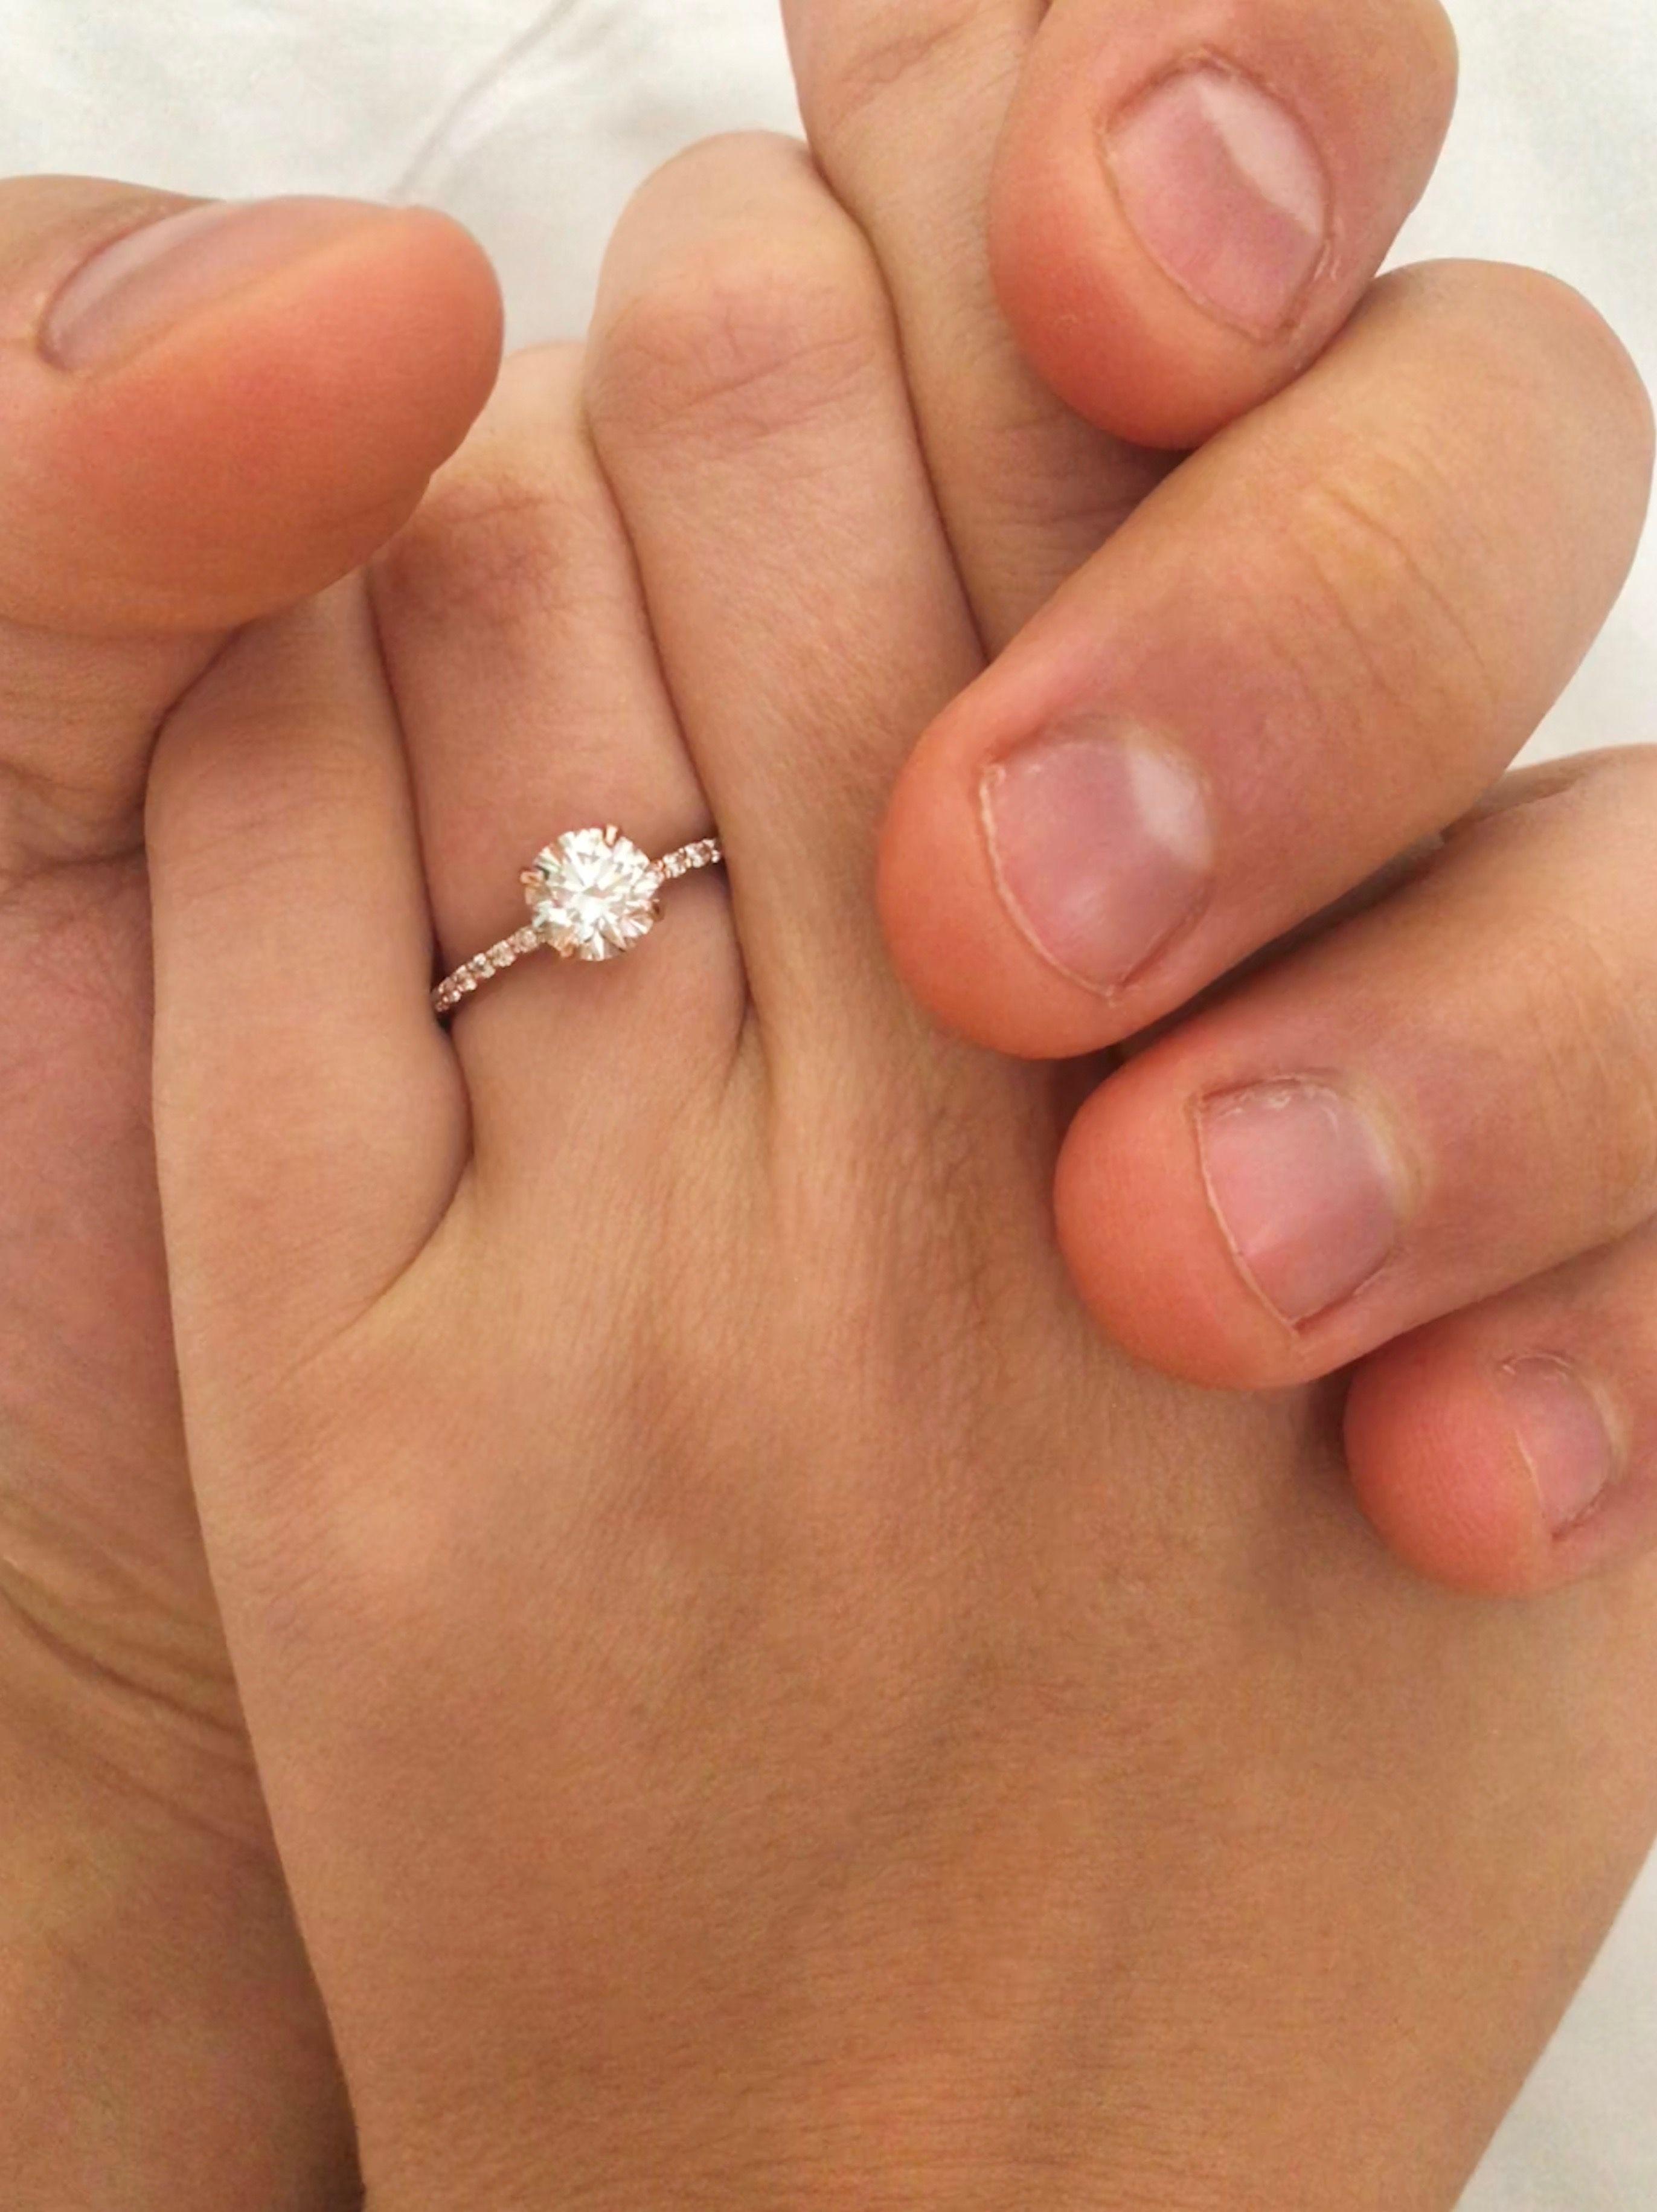 Rose Gold Pave Band 1 03 Carat Round Diamond Basically My Fiance K Flower Diamond Engagement Ring Round Diamond Engagement Rings 14k White Gold Diamond Ring